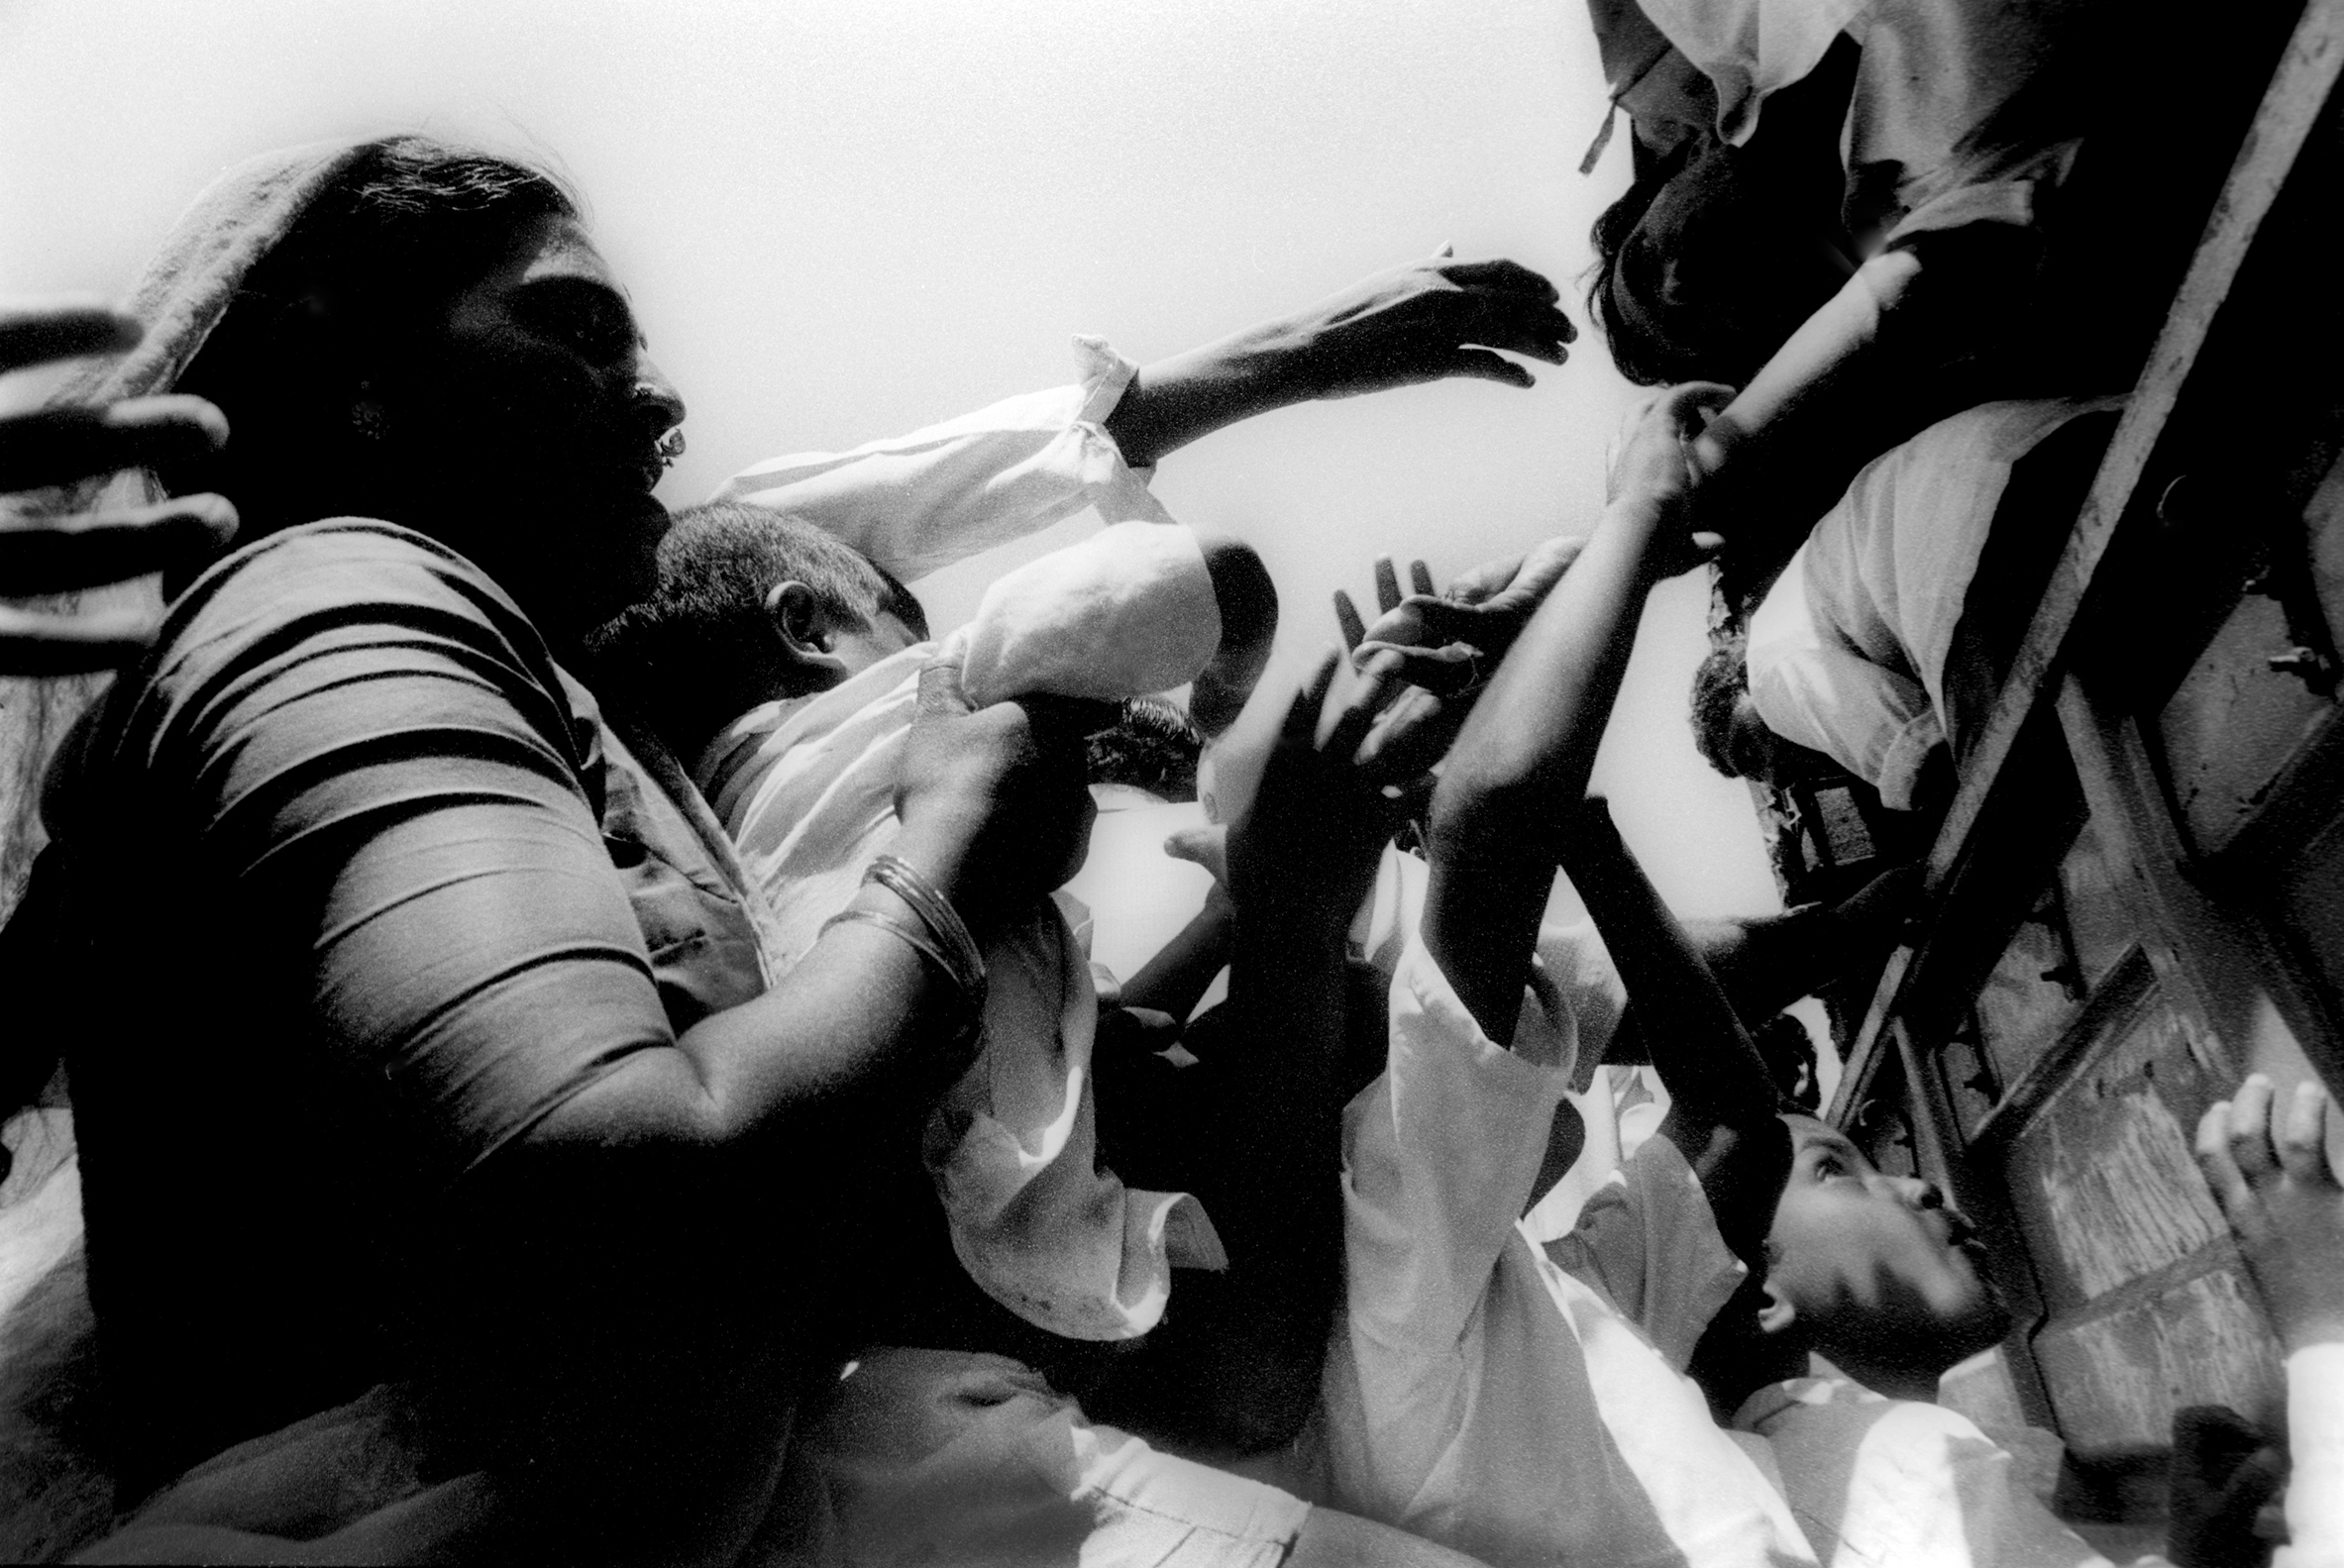 Maharashtra earthquake survivors receive aide. India, 1993